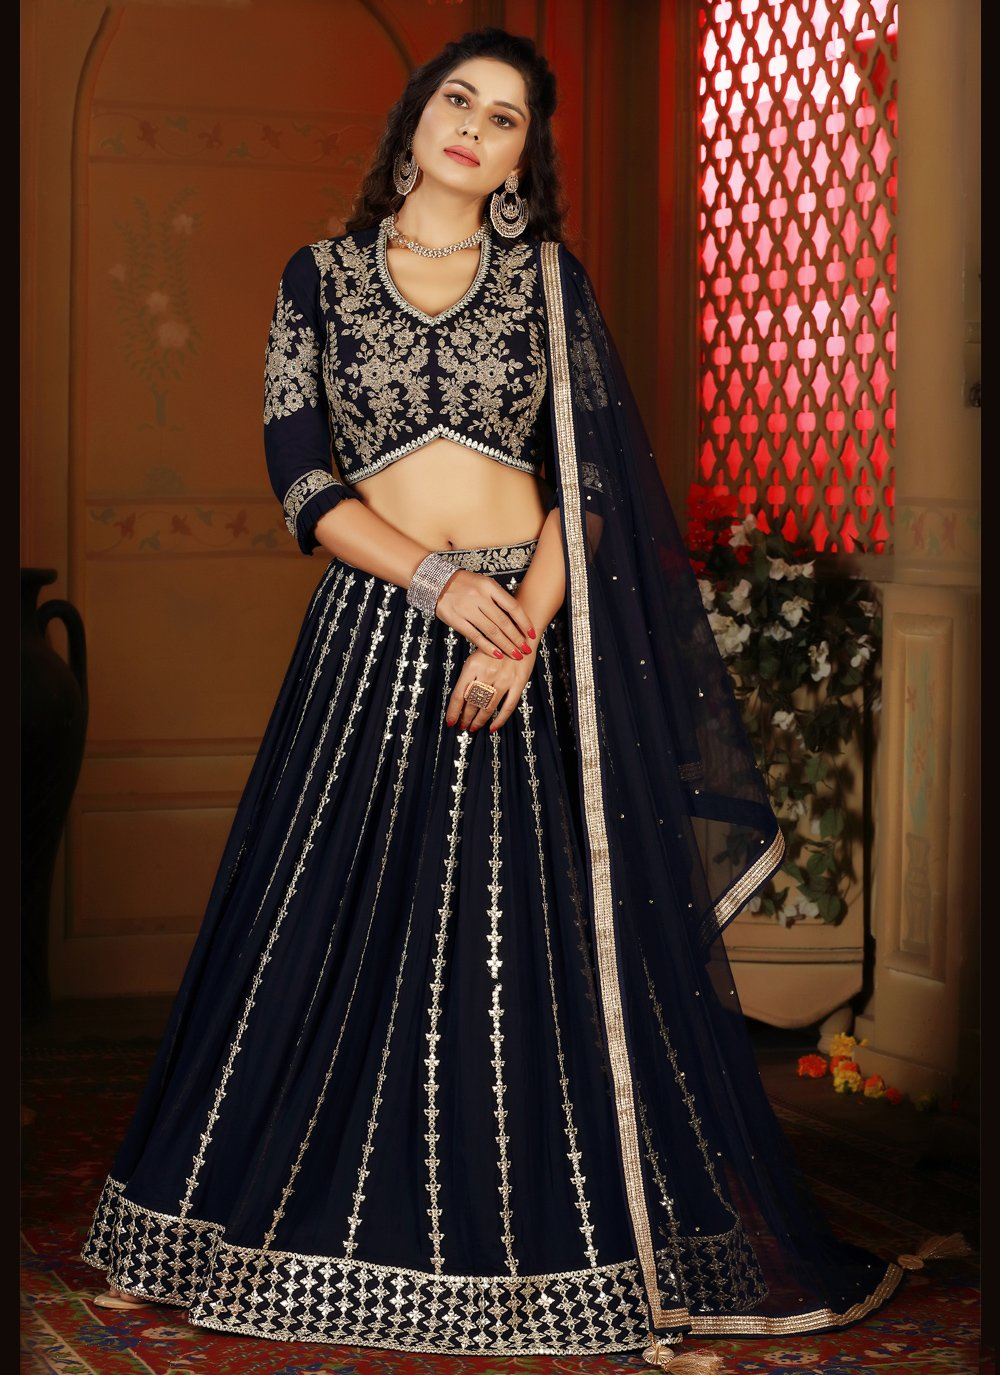 Faux Georgette Readymade Lehenga Choli in Navy Blue